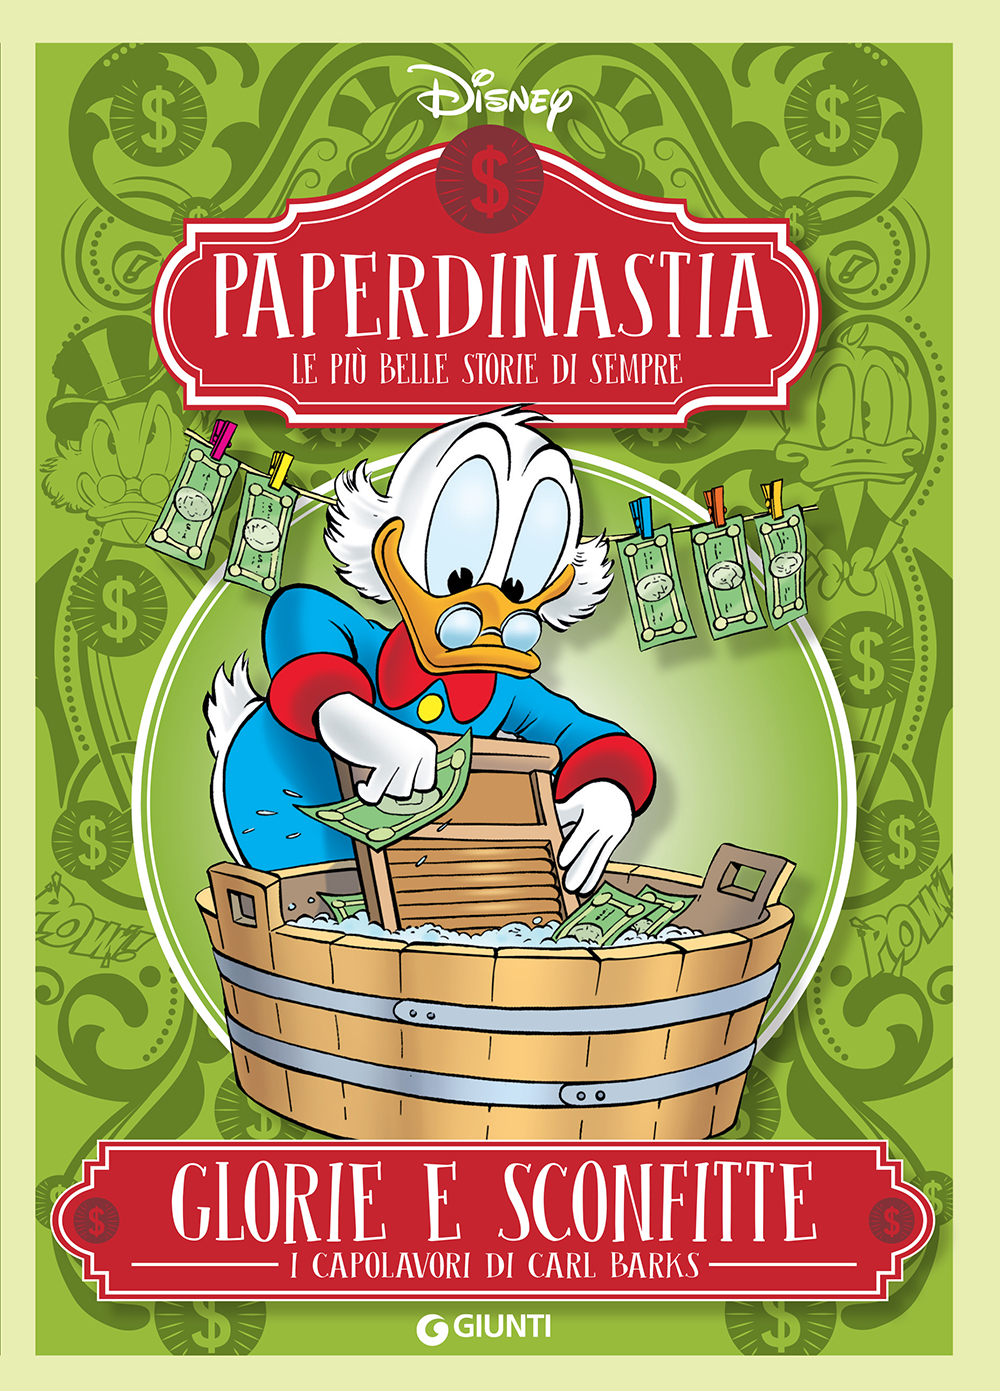 Paperdinastia - Glorie e sconfitte